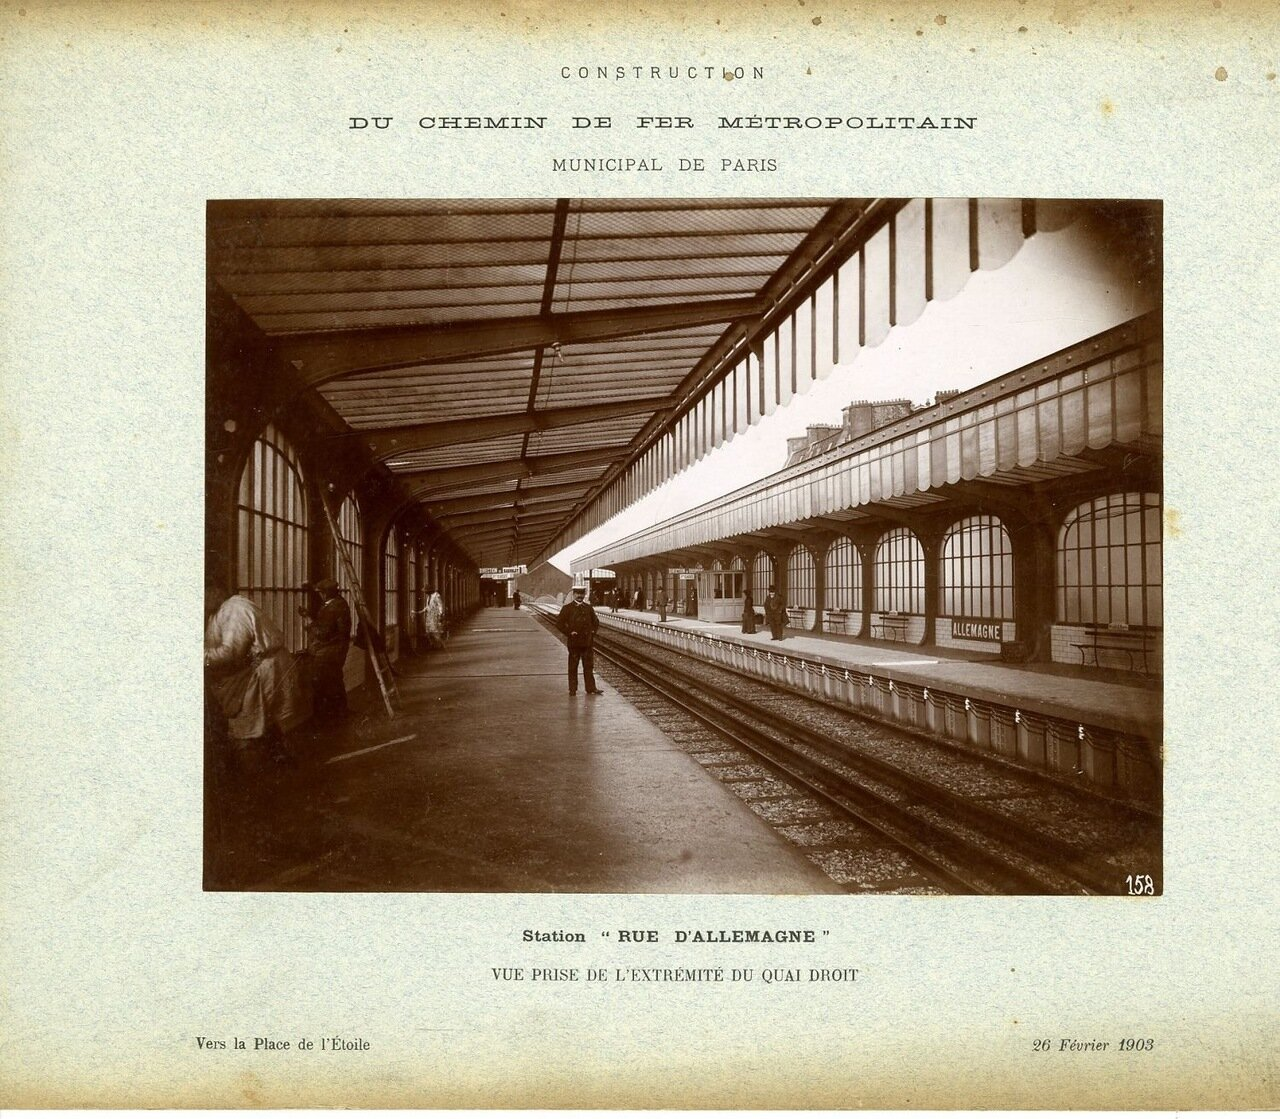 1903, 26 февраля